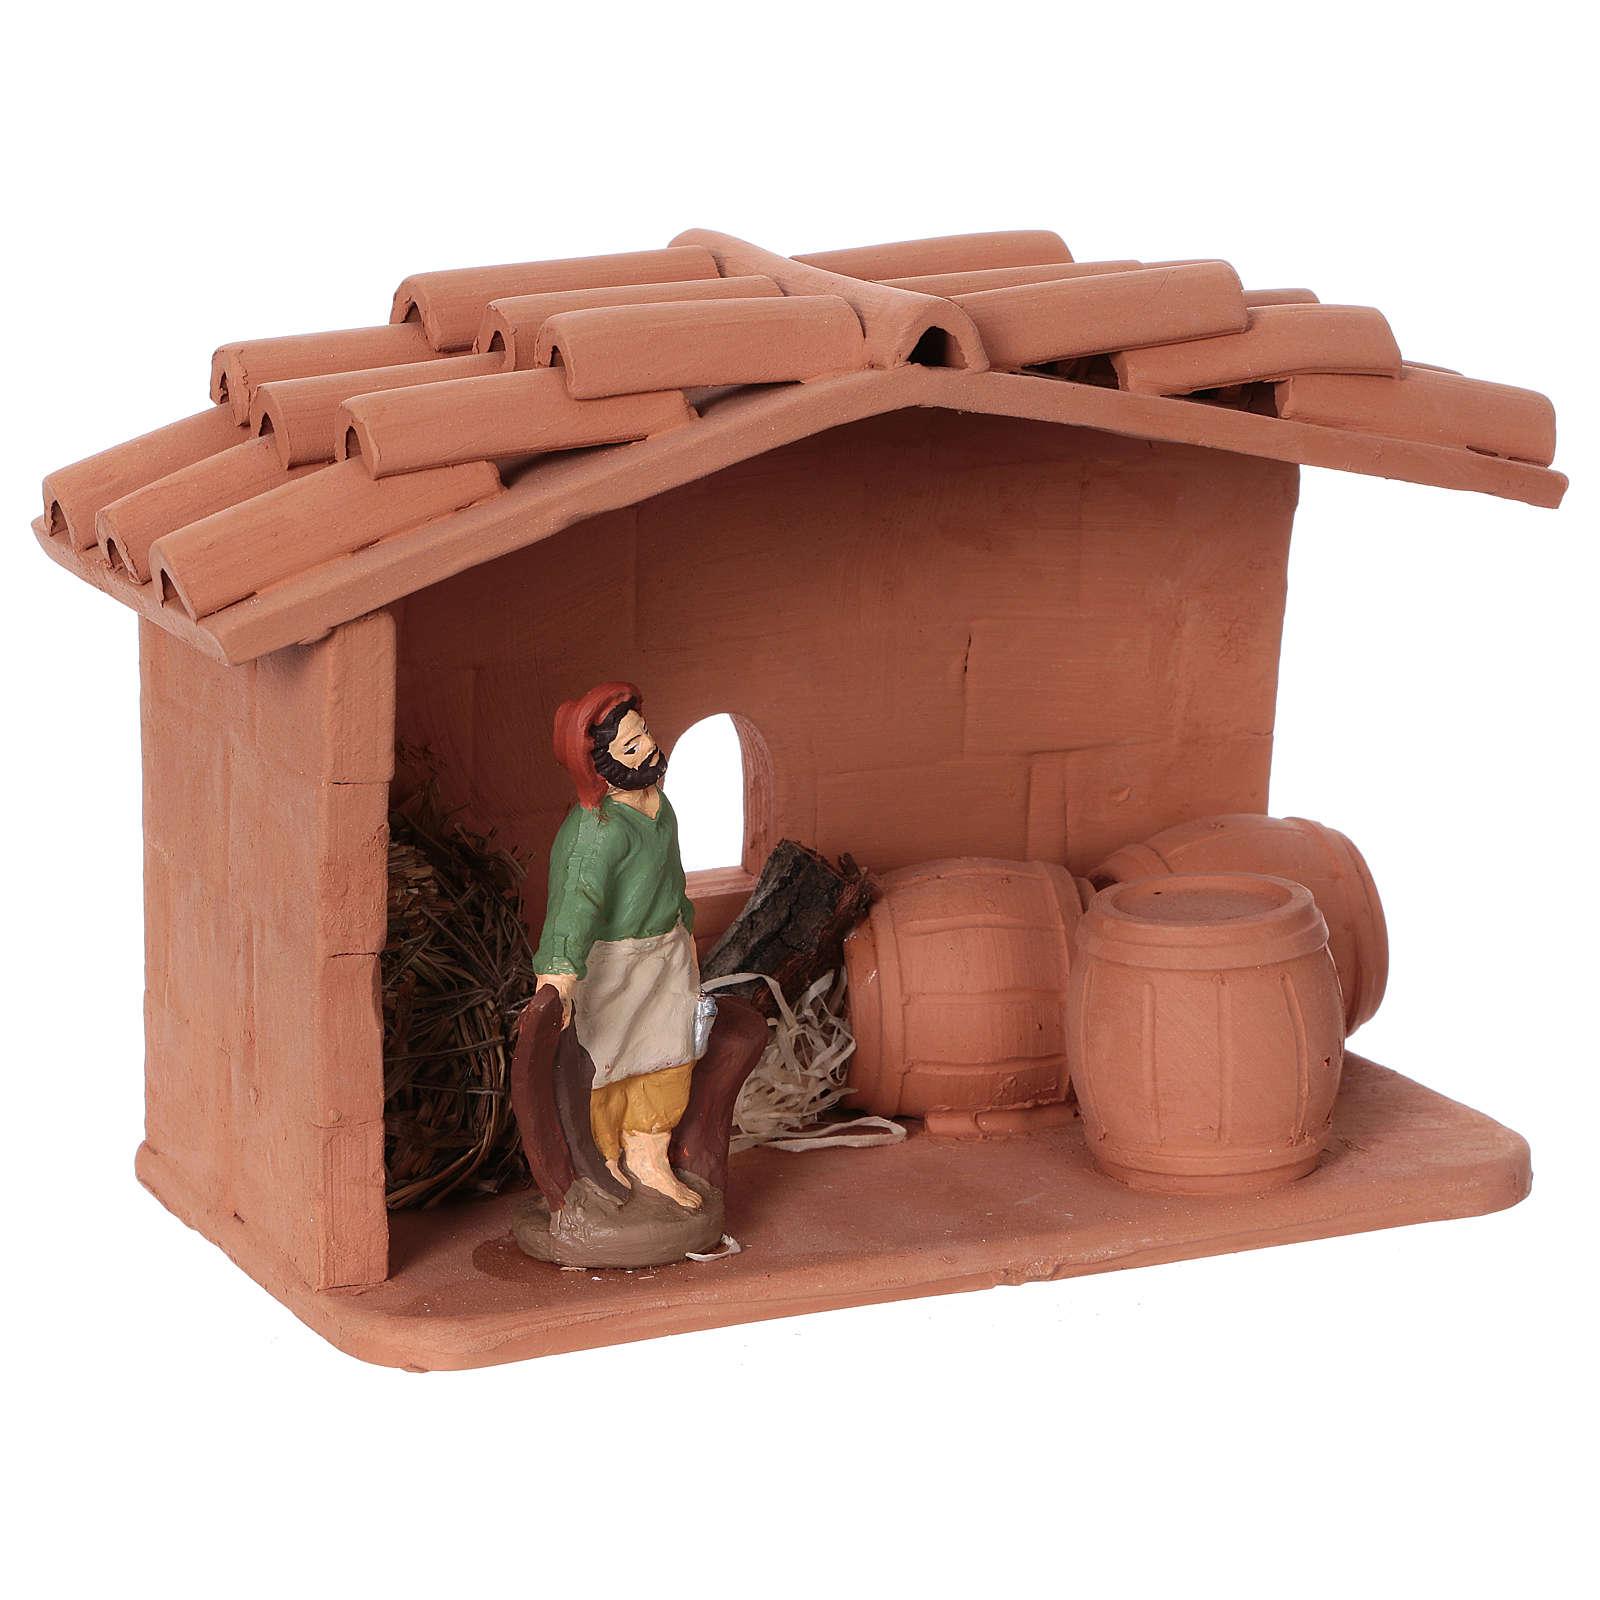 Terracotta cooper for Nativity scene 10 cm made in Deruta 4